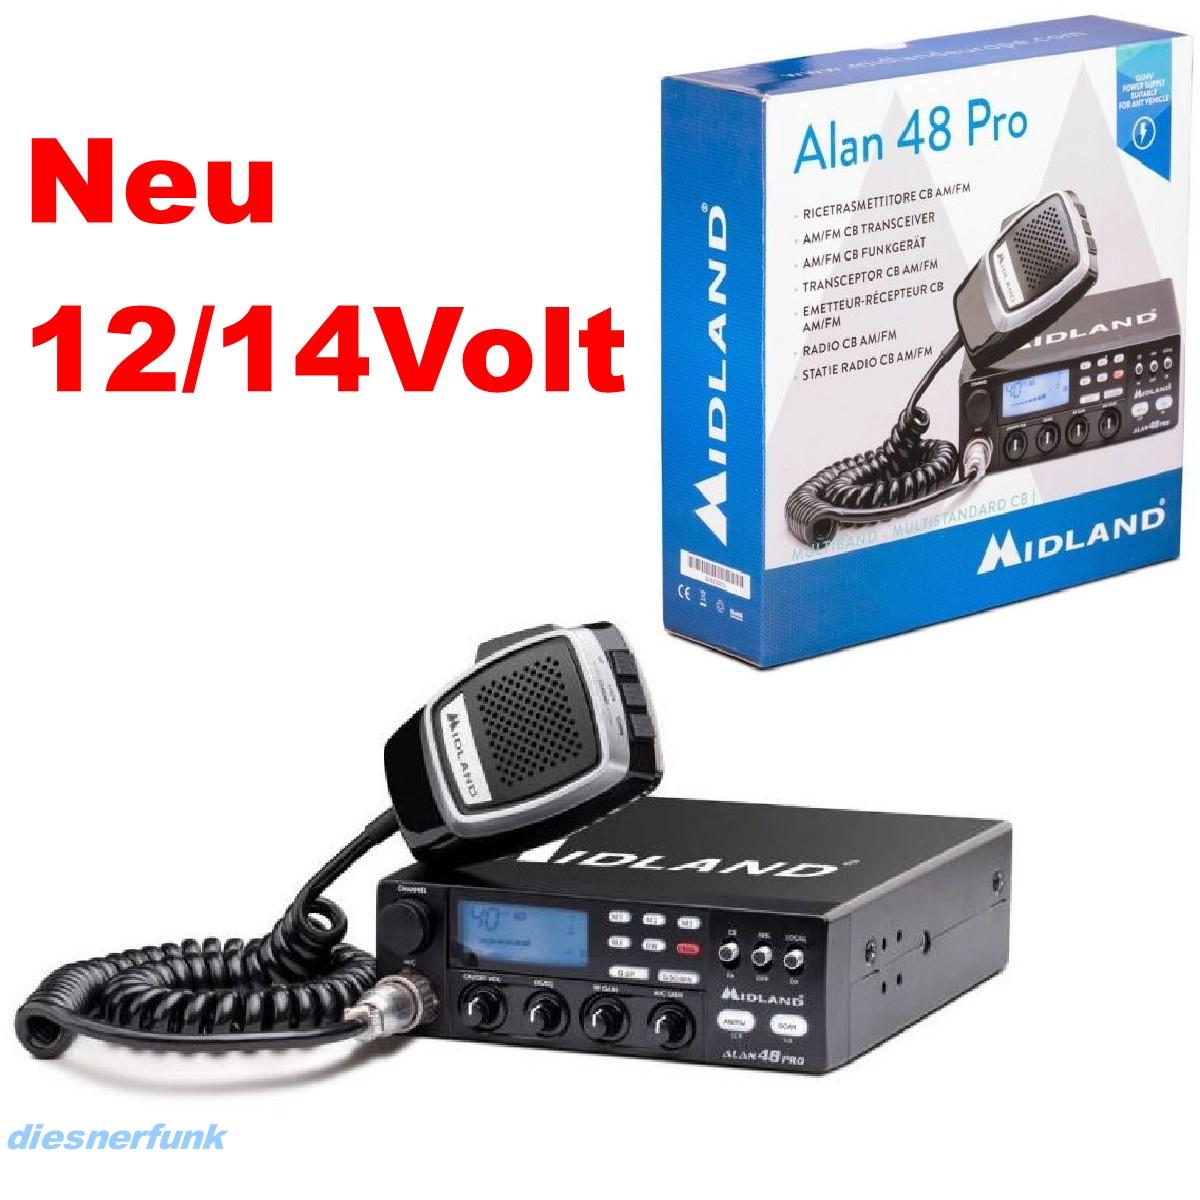 2 Stücke 2SC2078 TO-220 27 Mhz Rf Leistungsverstärker fv